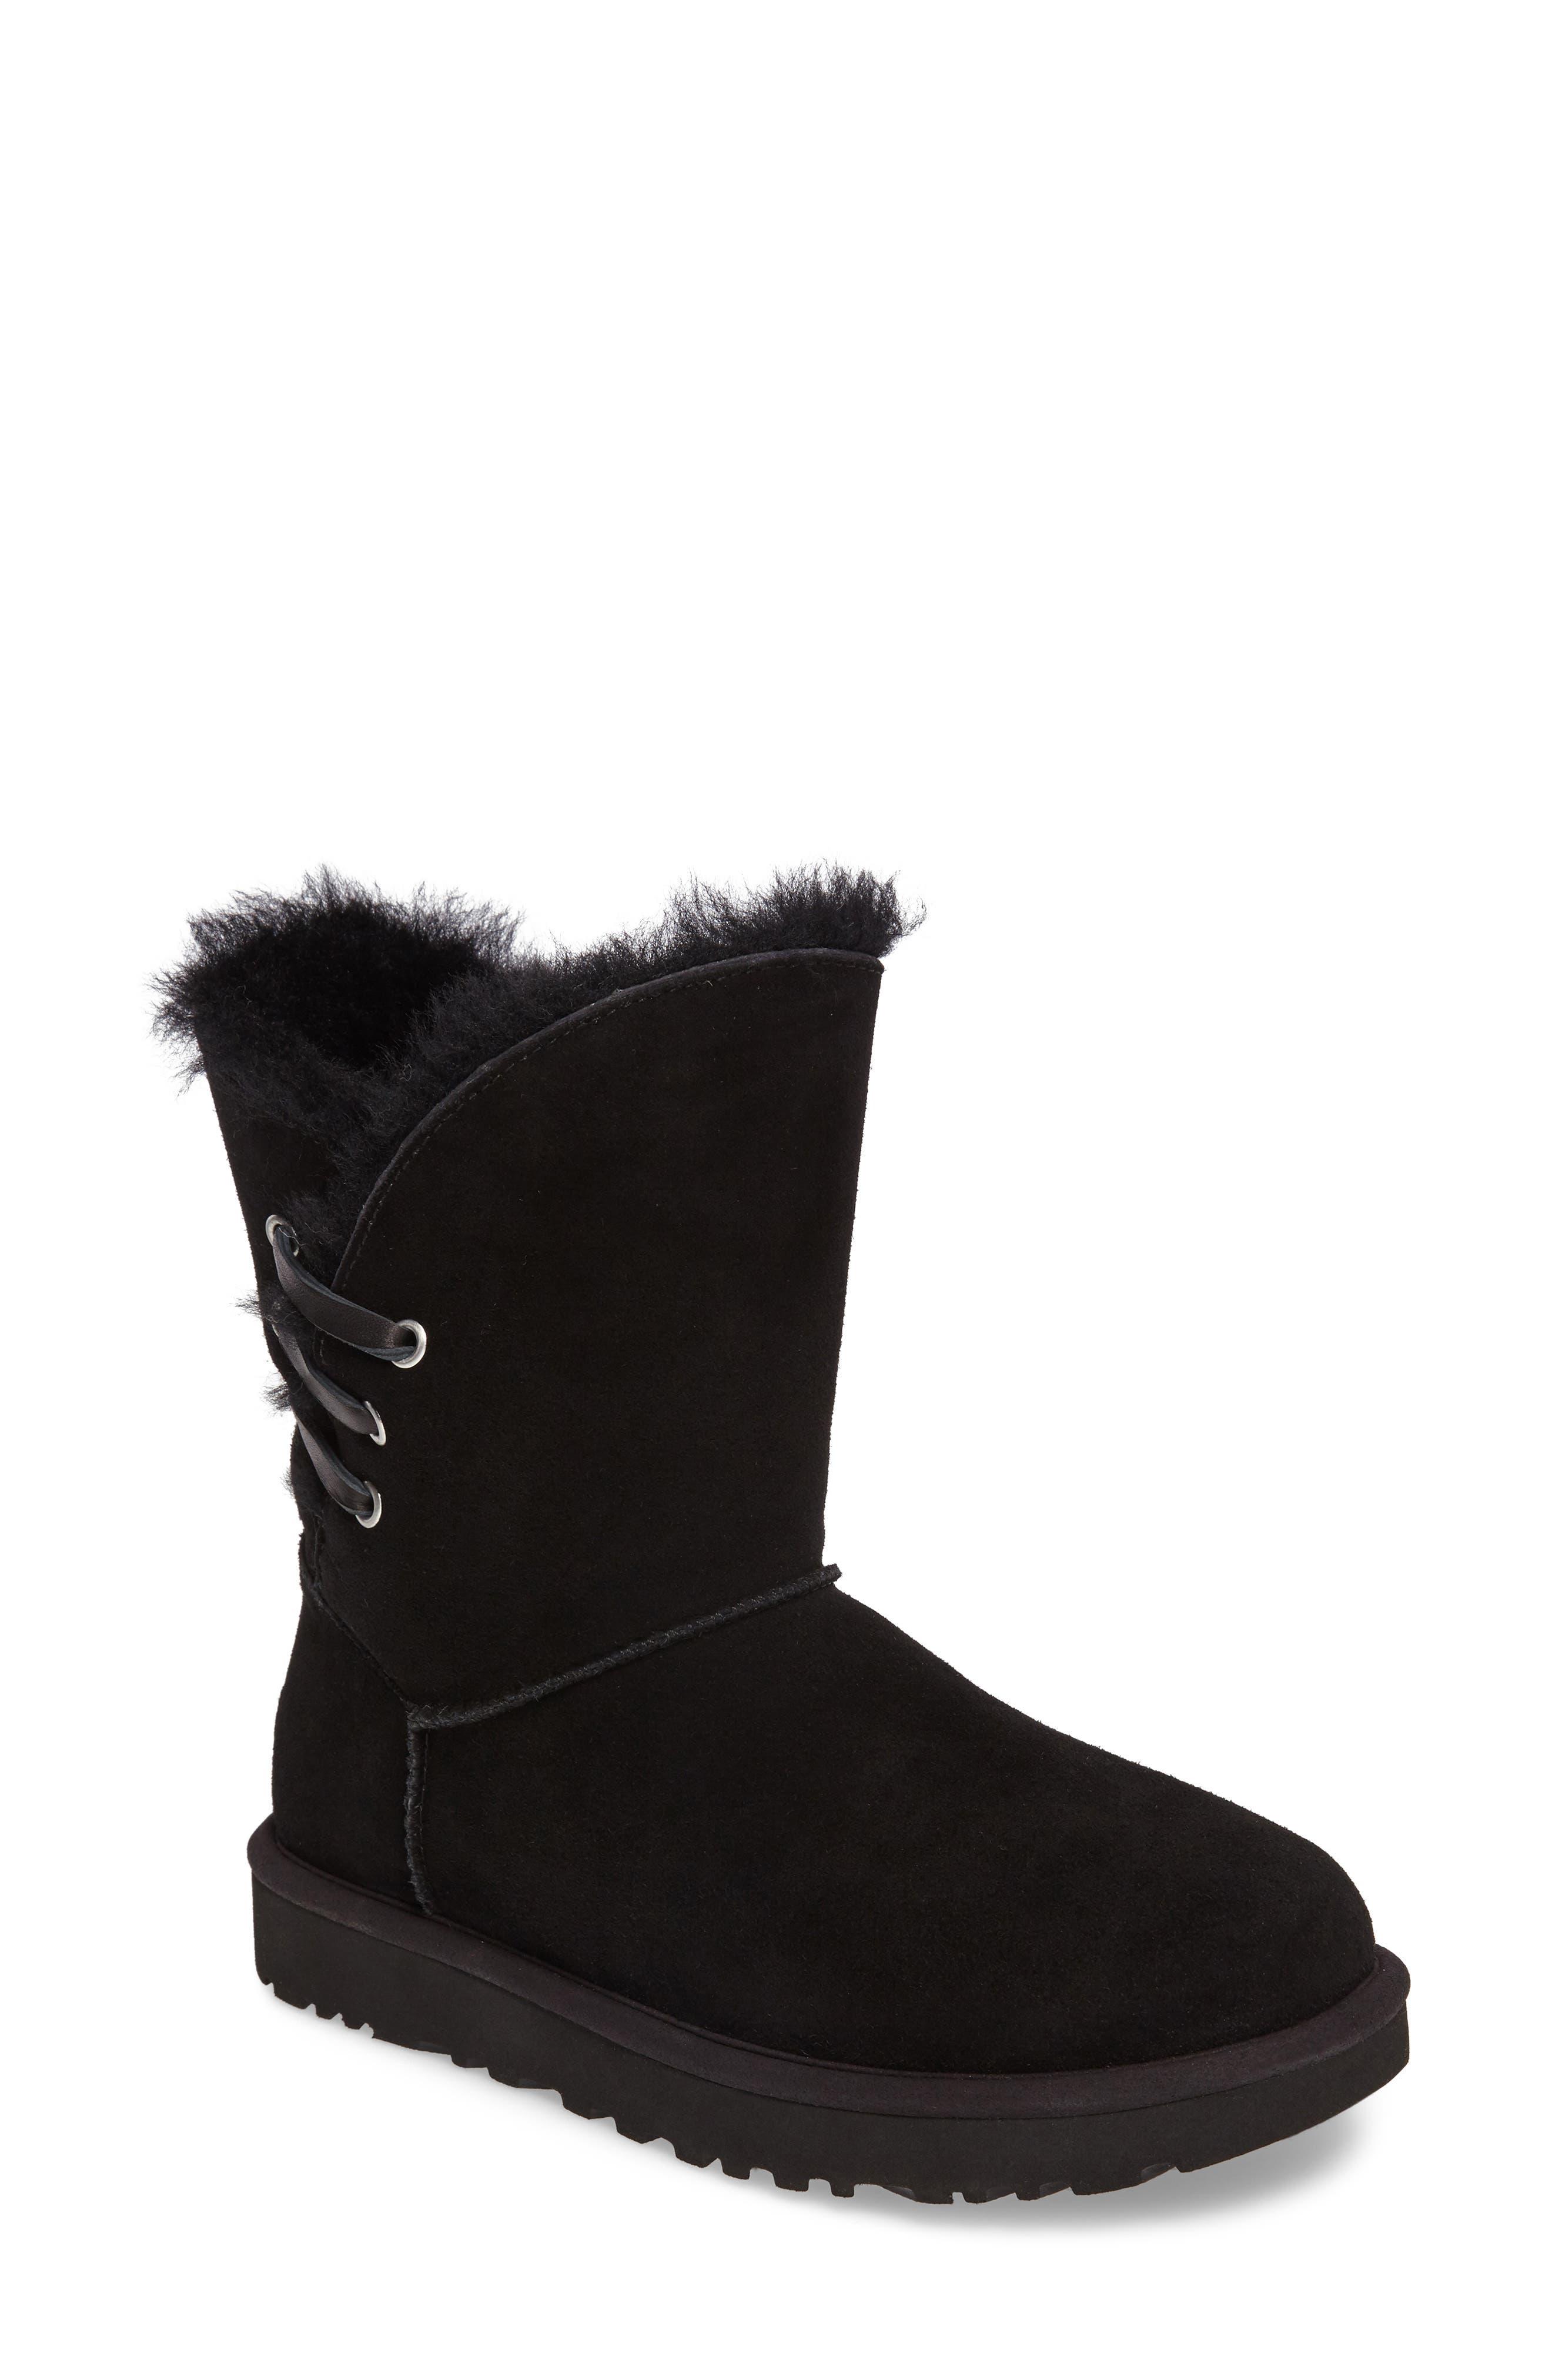 Alternate Image 1 Selected - UGG® Constantine Boot (Women)